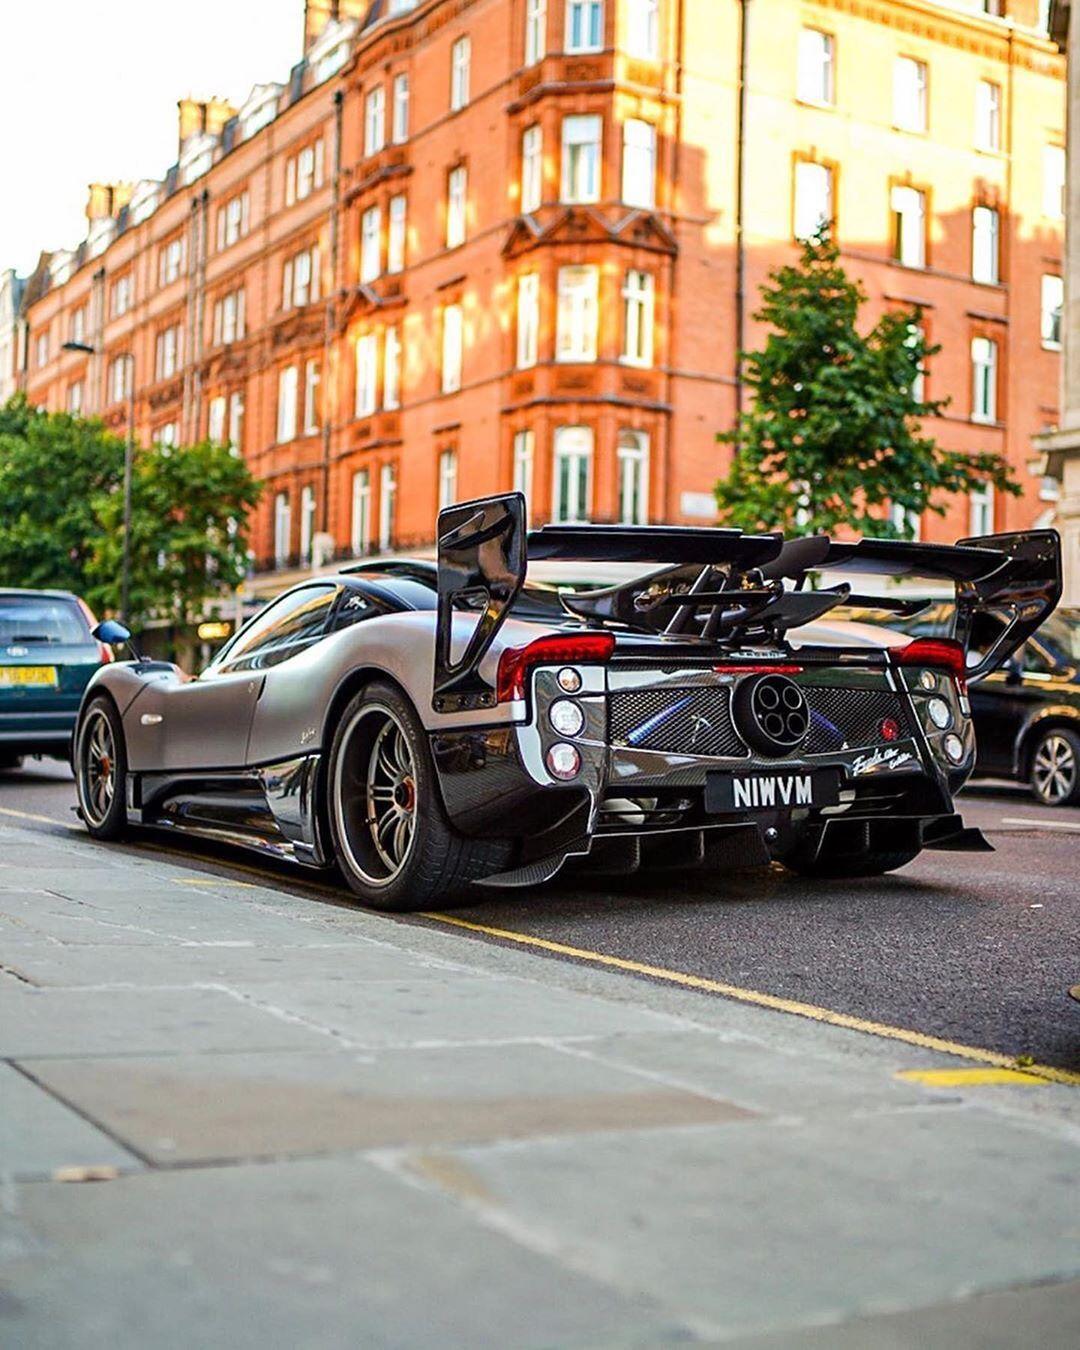 Photo of Amojunn Cars /// Concept Cars Awesome  #sportcars #customcars #luxurycars #sportcars